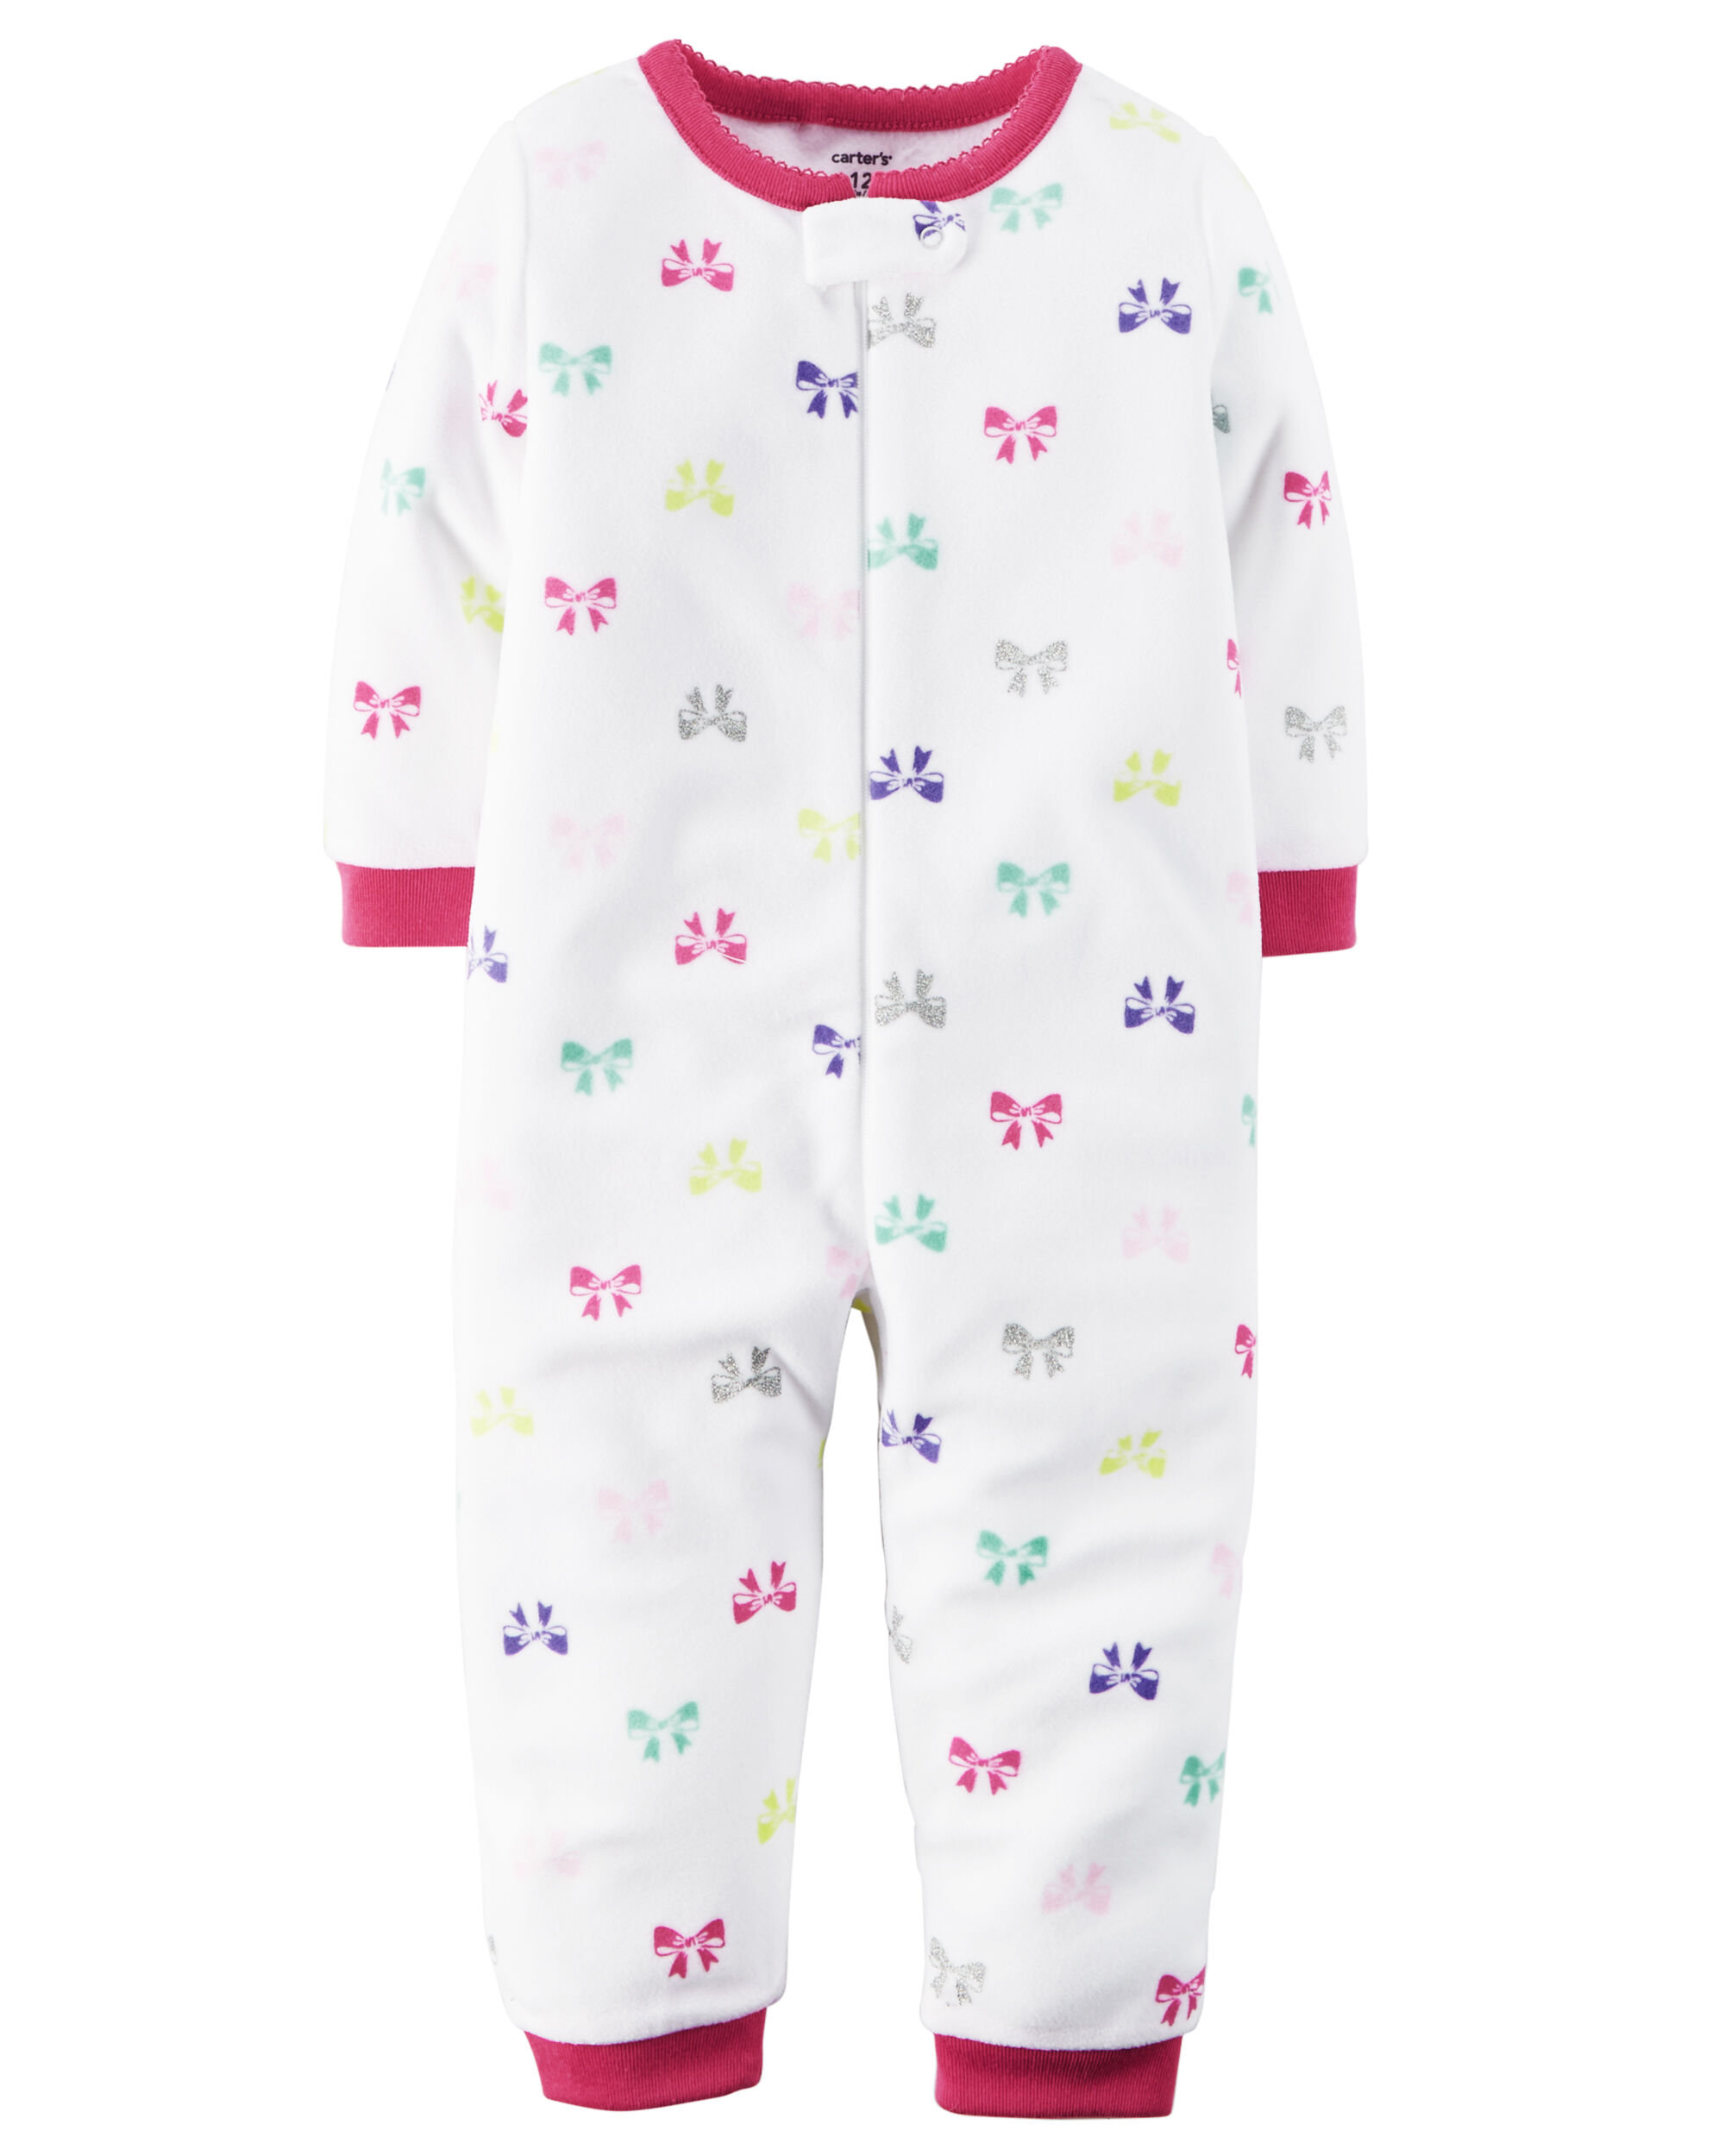 women disney prod p wid one sleepers piece mermaid sleeper little s pajamas hei qlt the